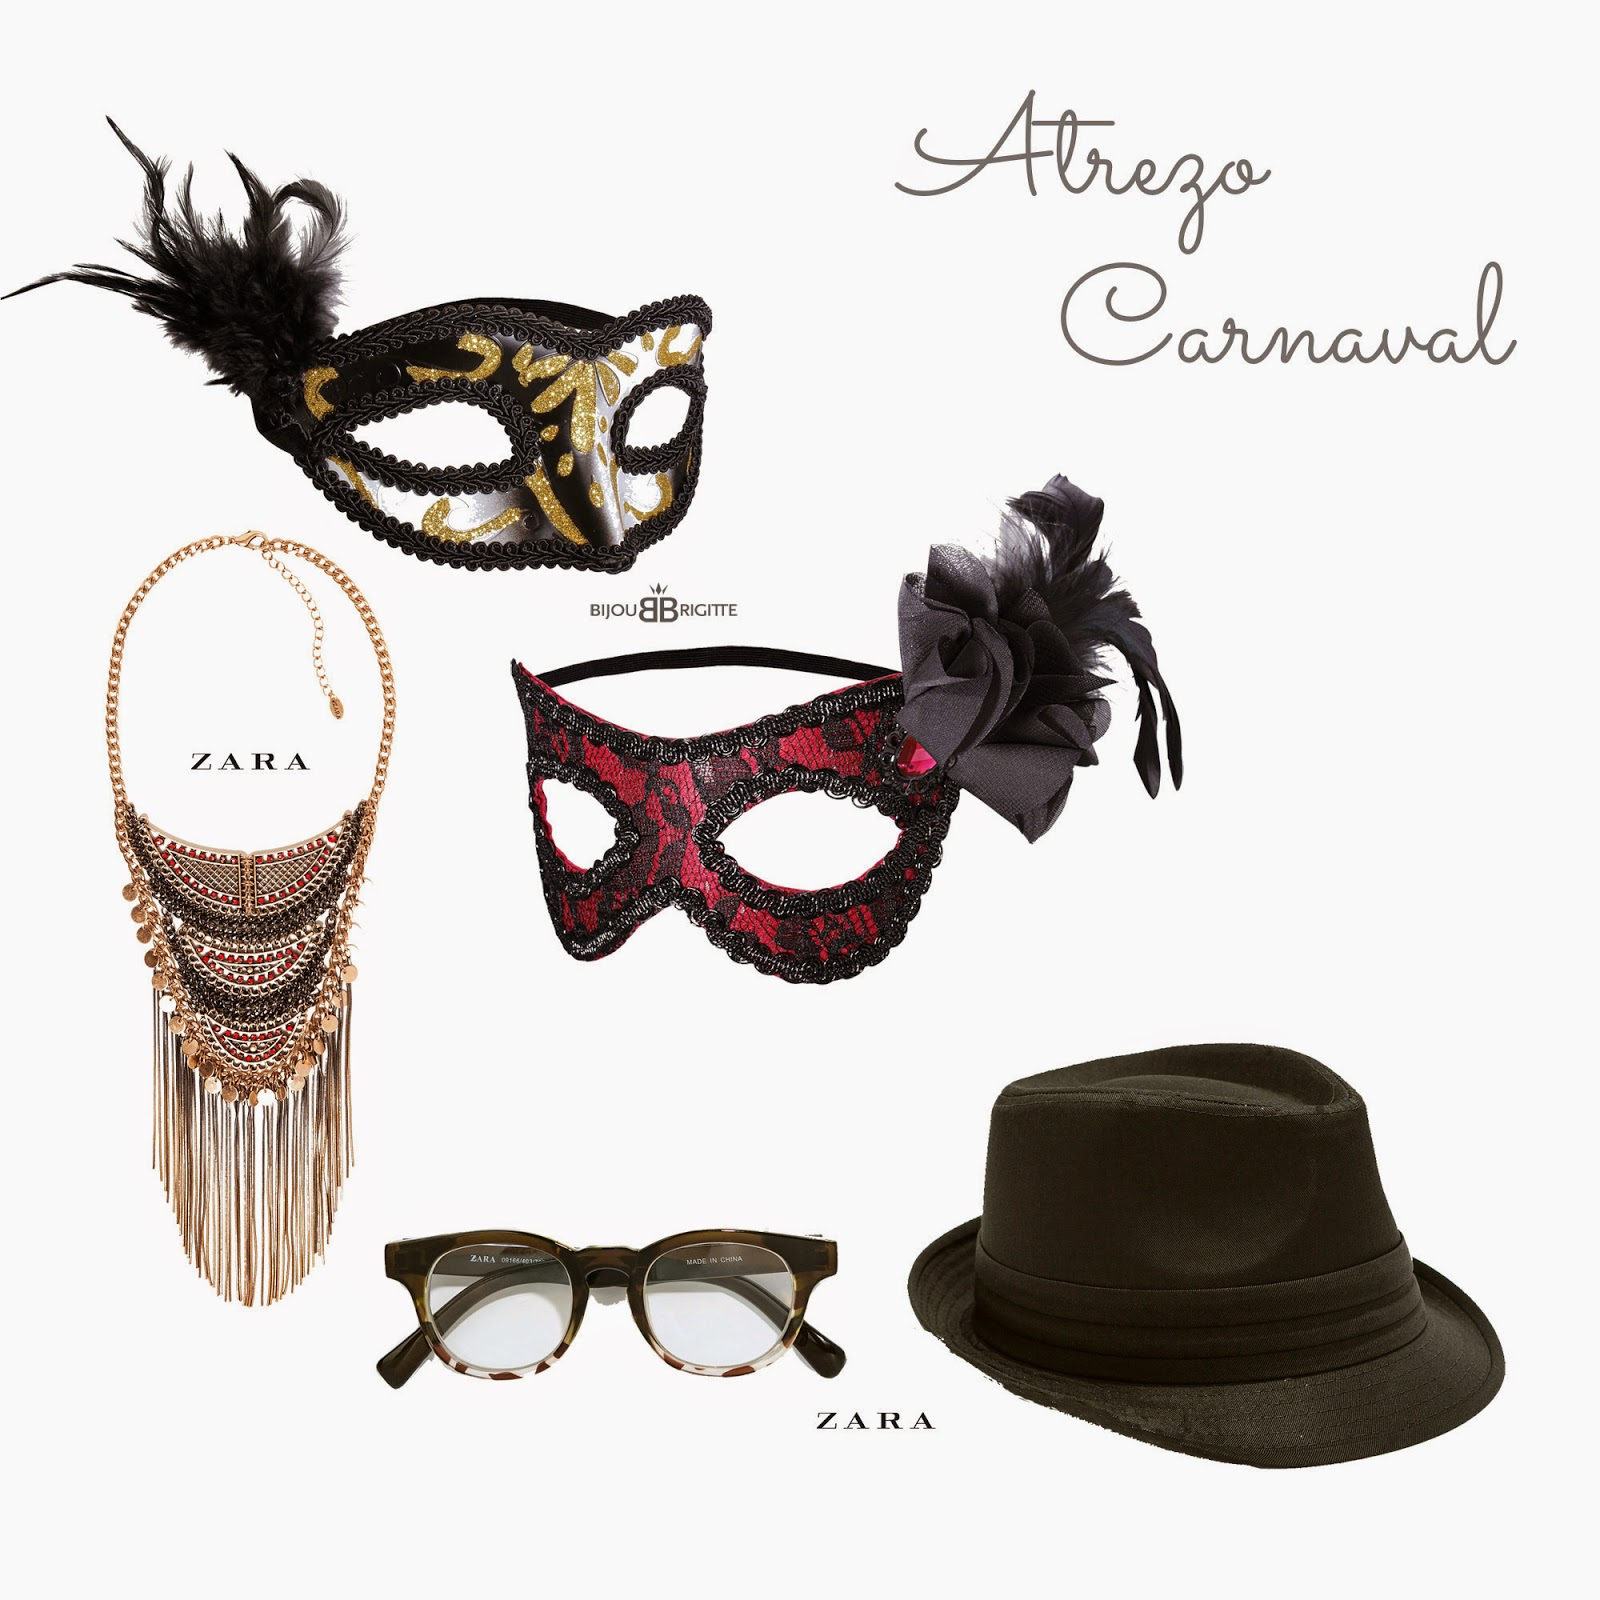 Atrezo Carnaval